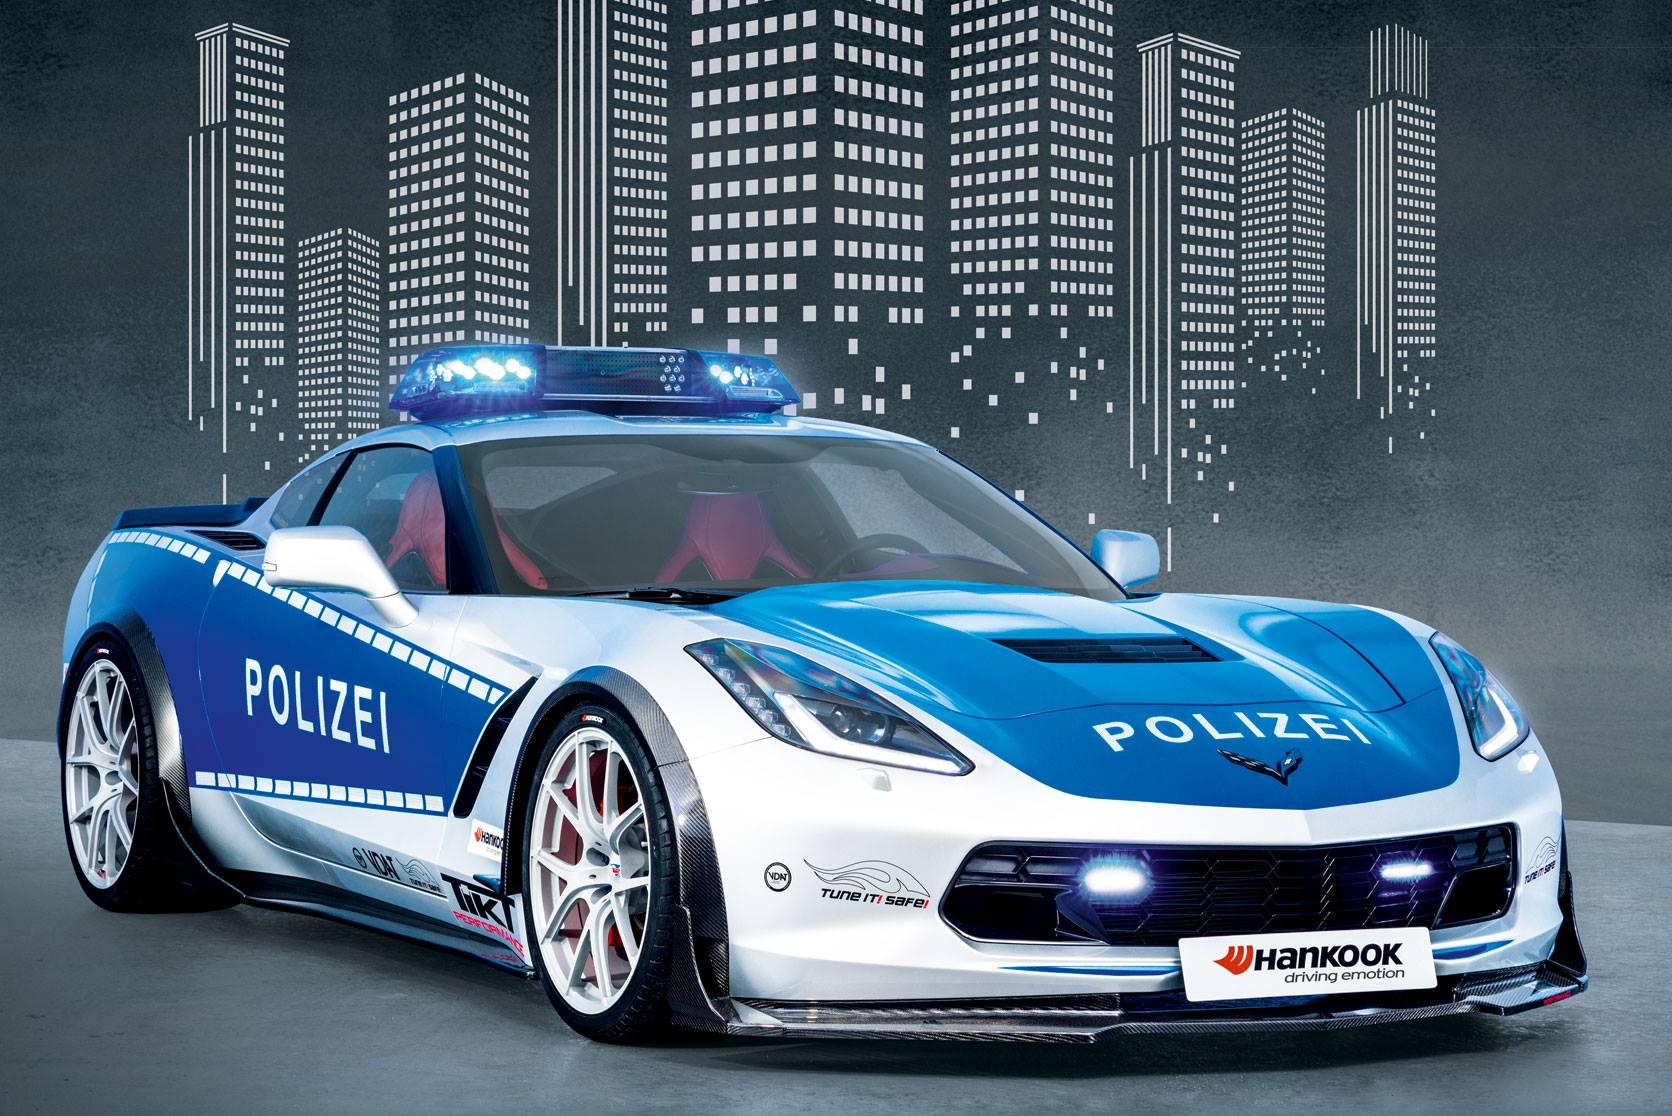 Tikt Performance Reveals Carbon Fiber Corvette Police Car